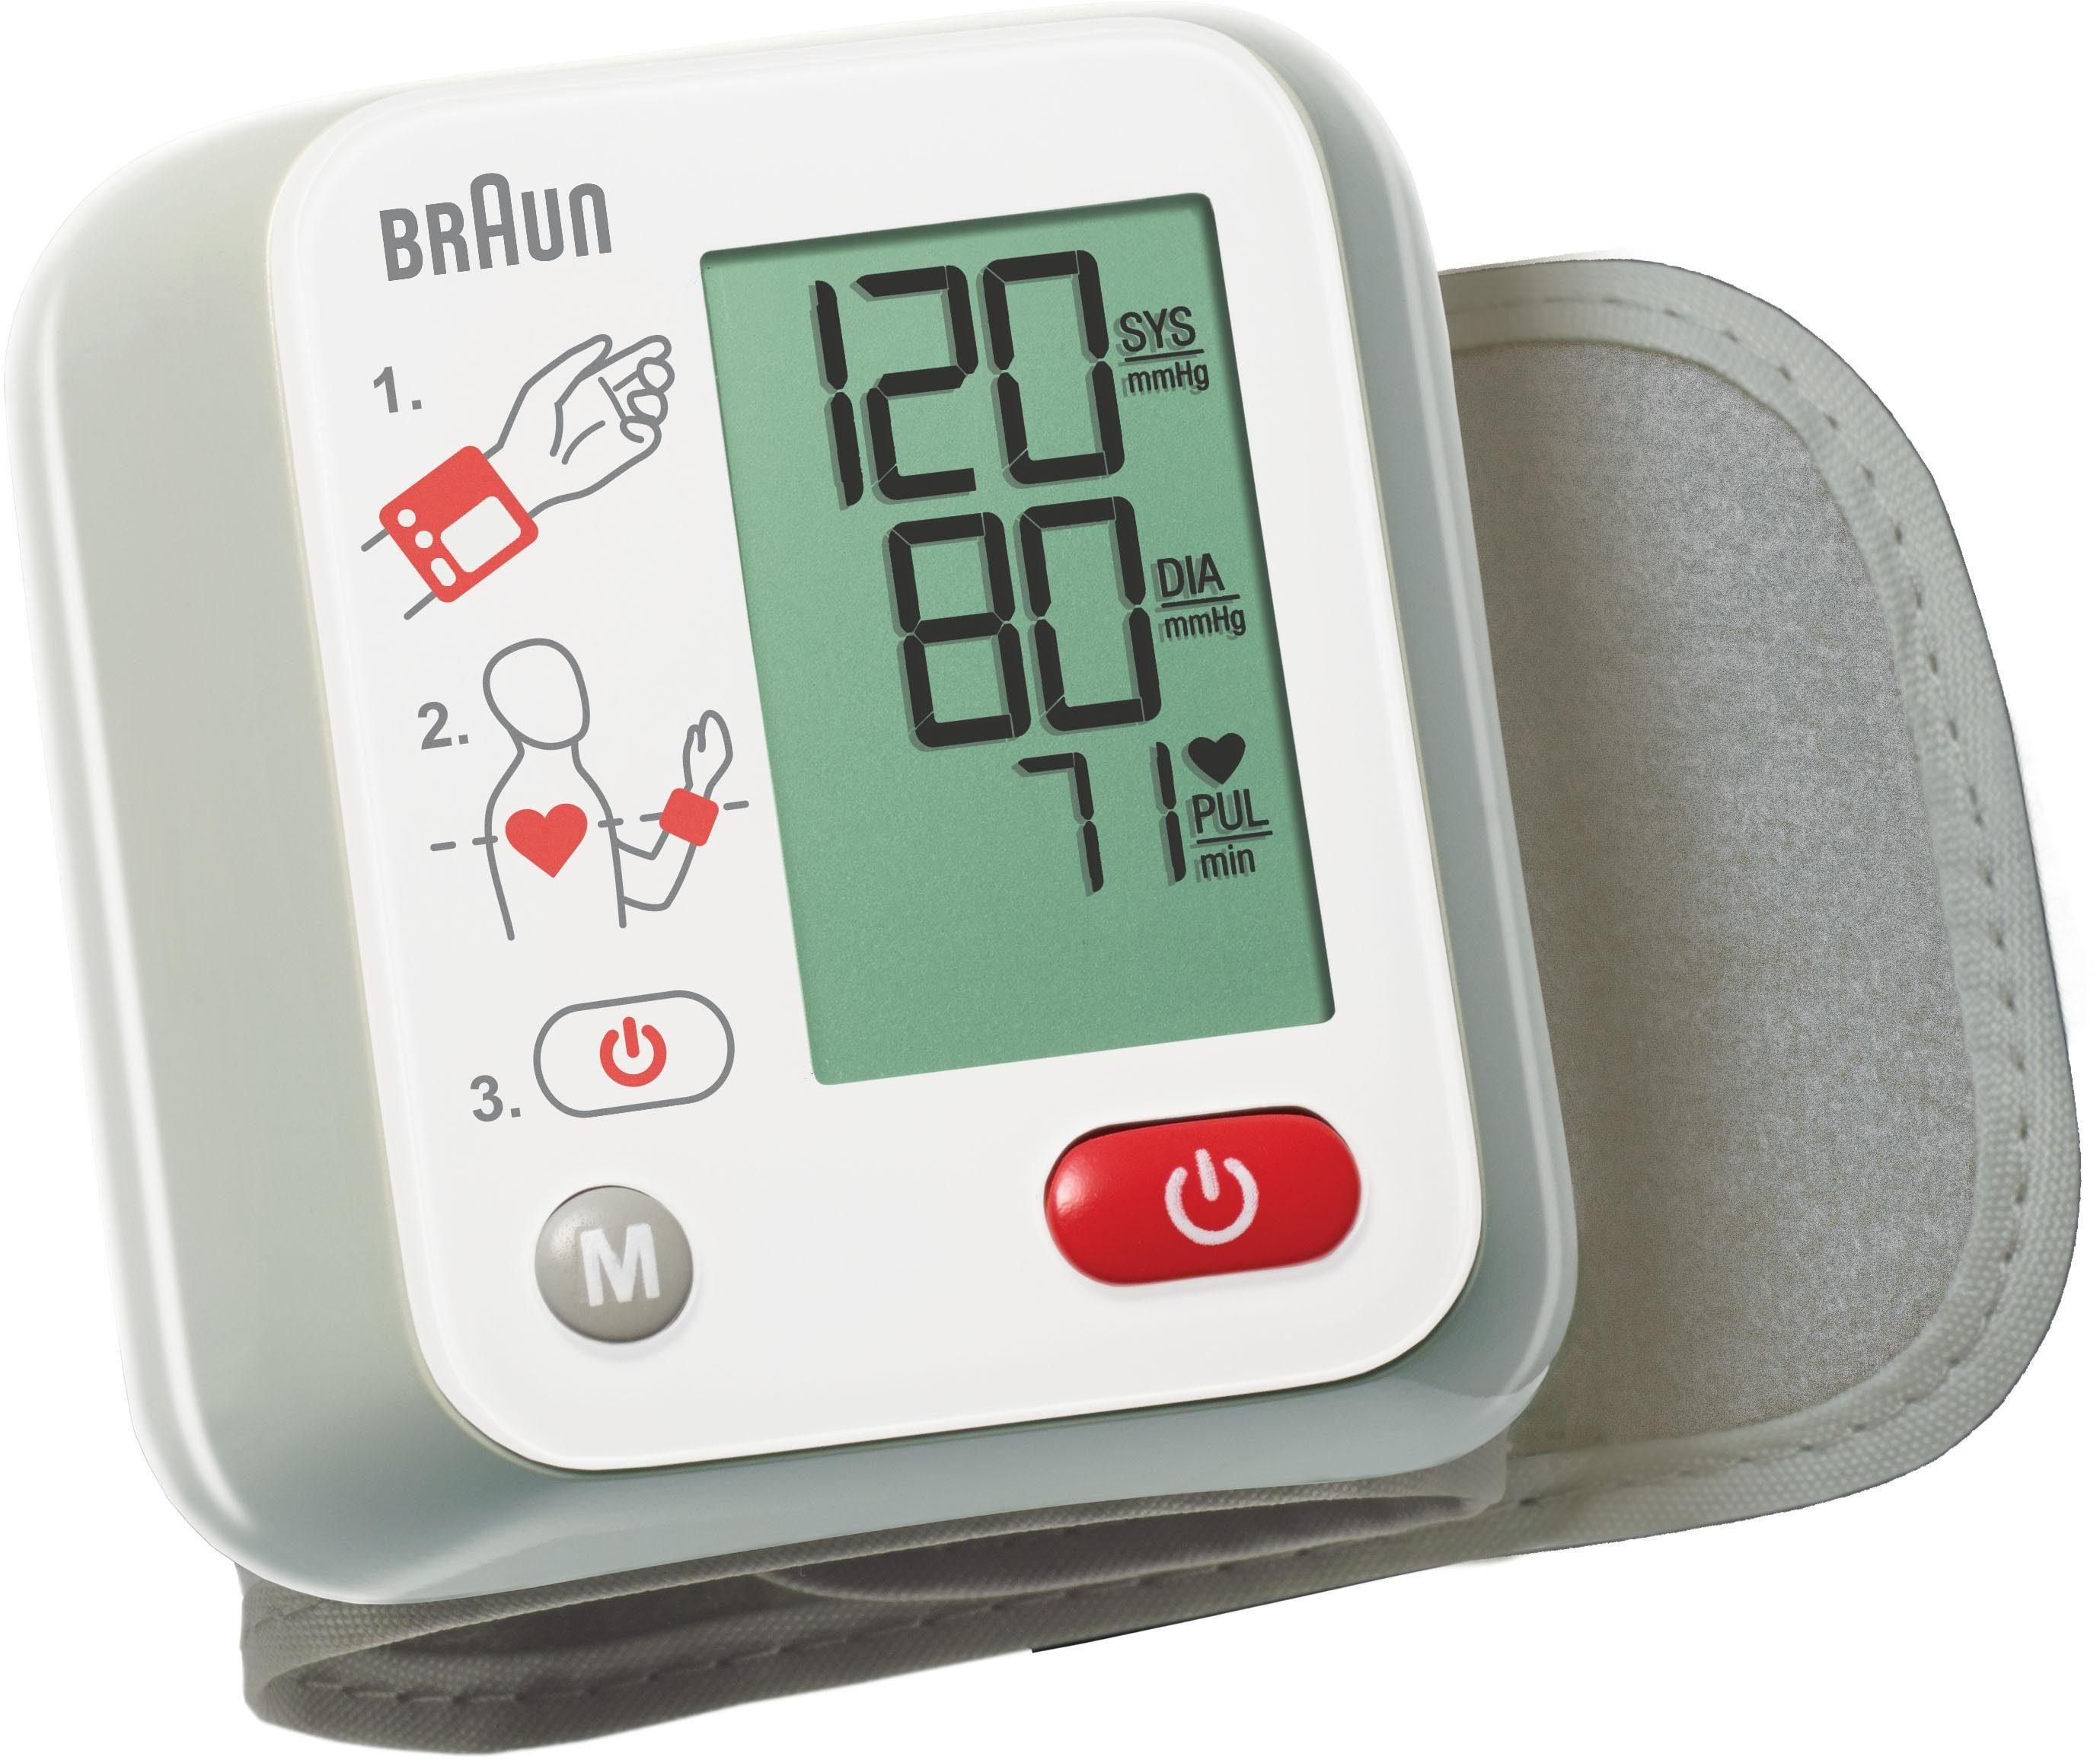 Braun Blutdruckmessgerät VitalScan1 BBP2000